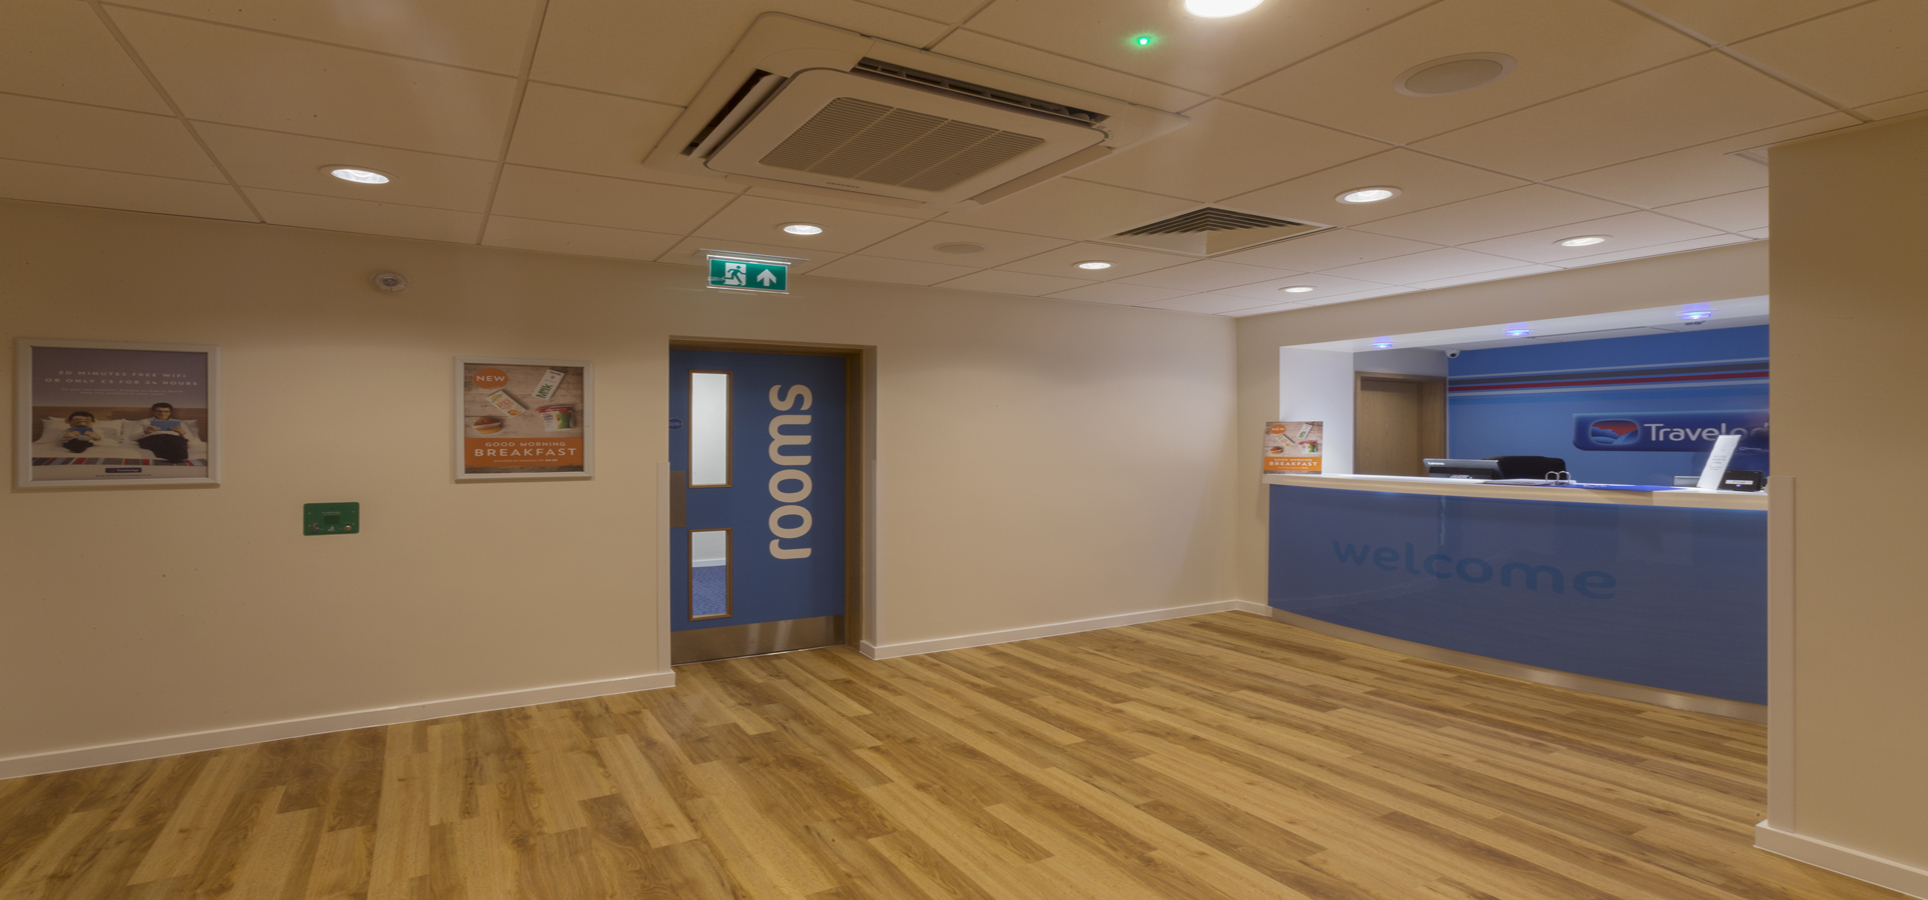 TRAVELODGE & PUREGYM, EAST GRINSTEAD, Jessops Construction Ltd